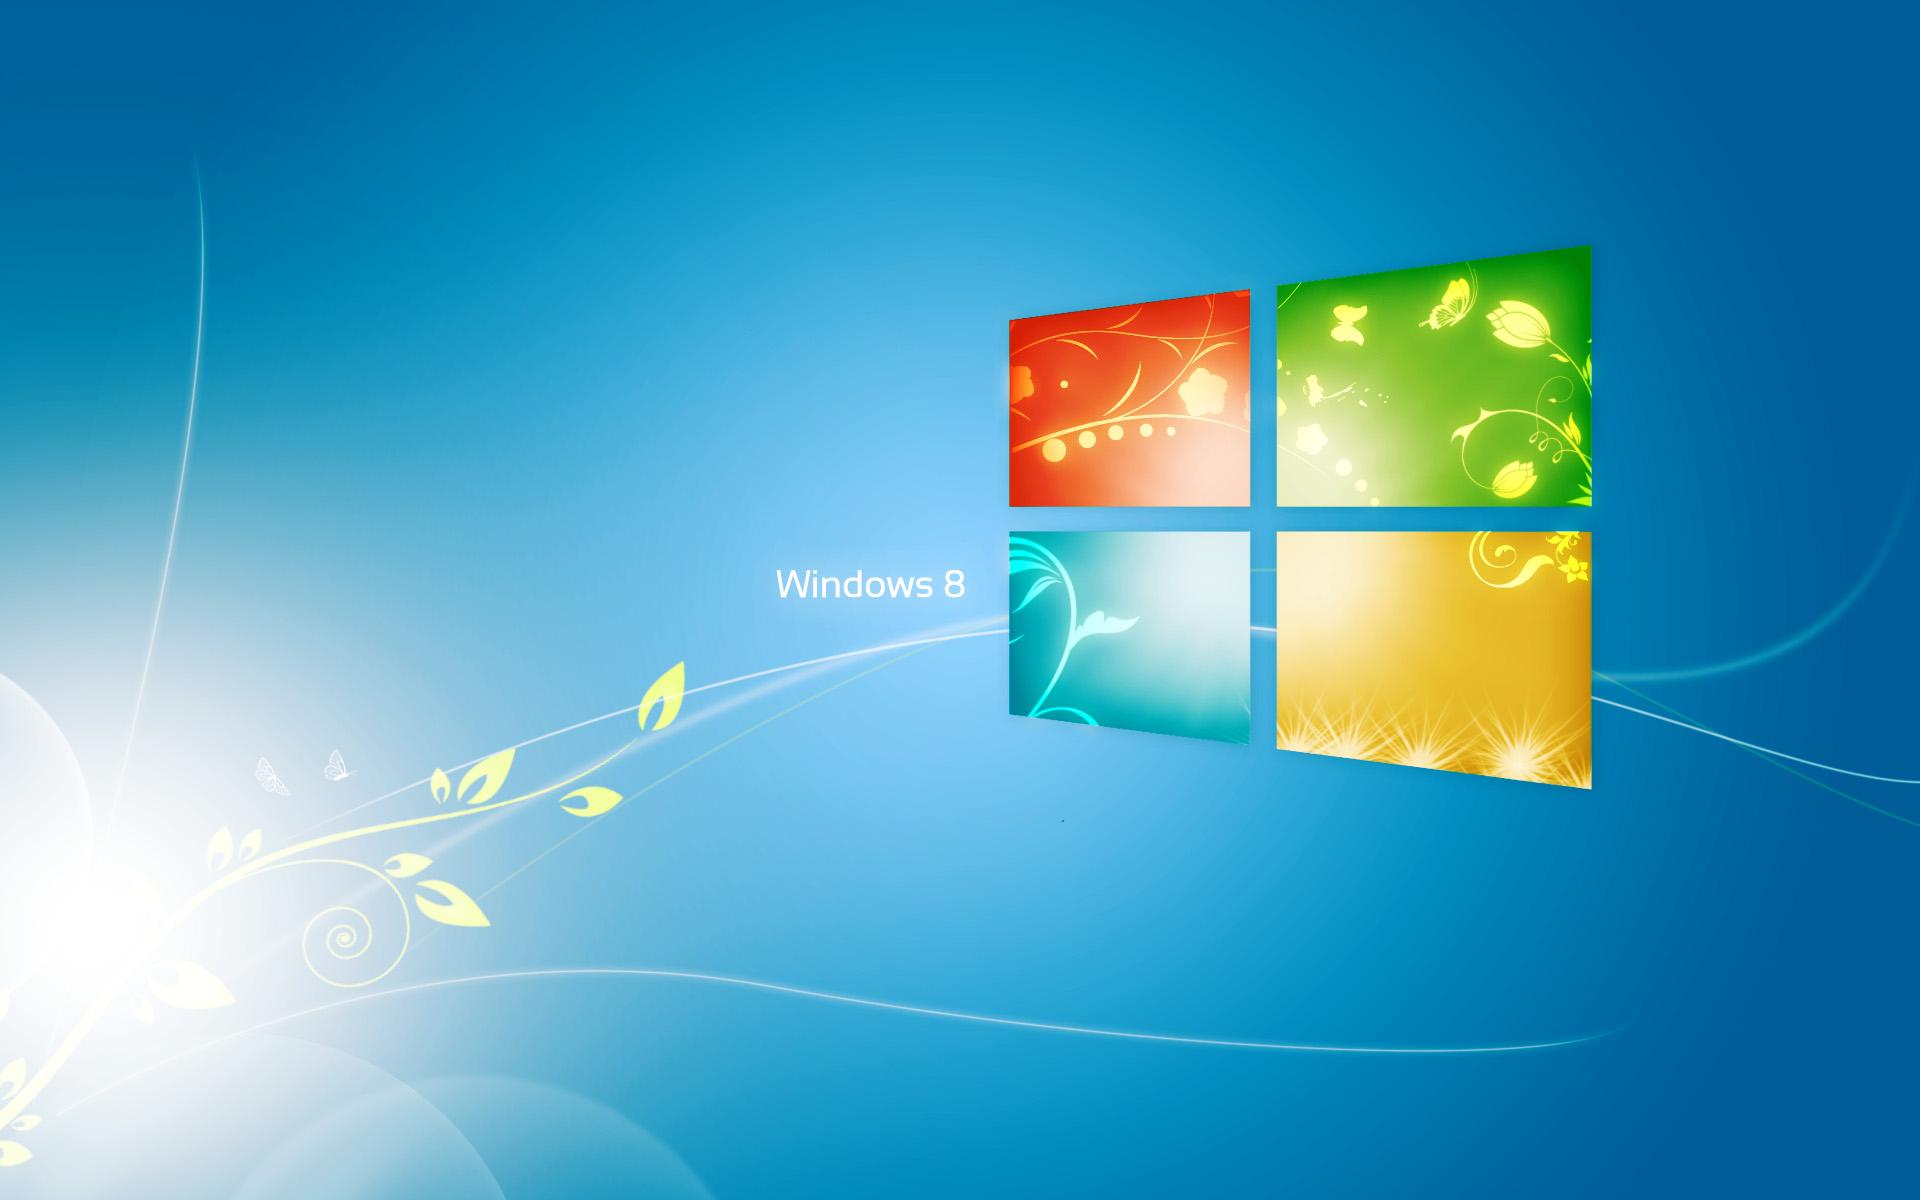 Read How to Change Windows 8 Start Screen Background using Windows 8 1920x1200